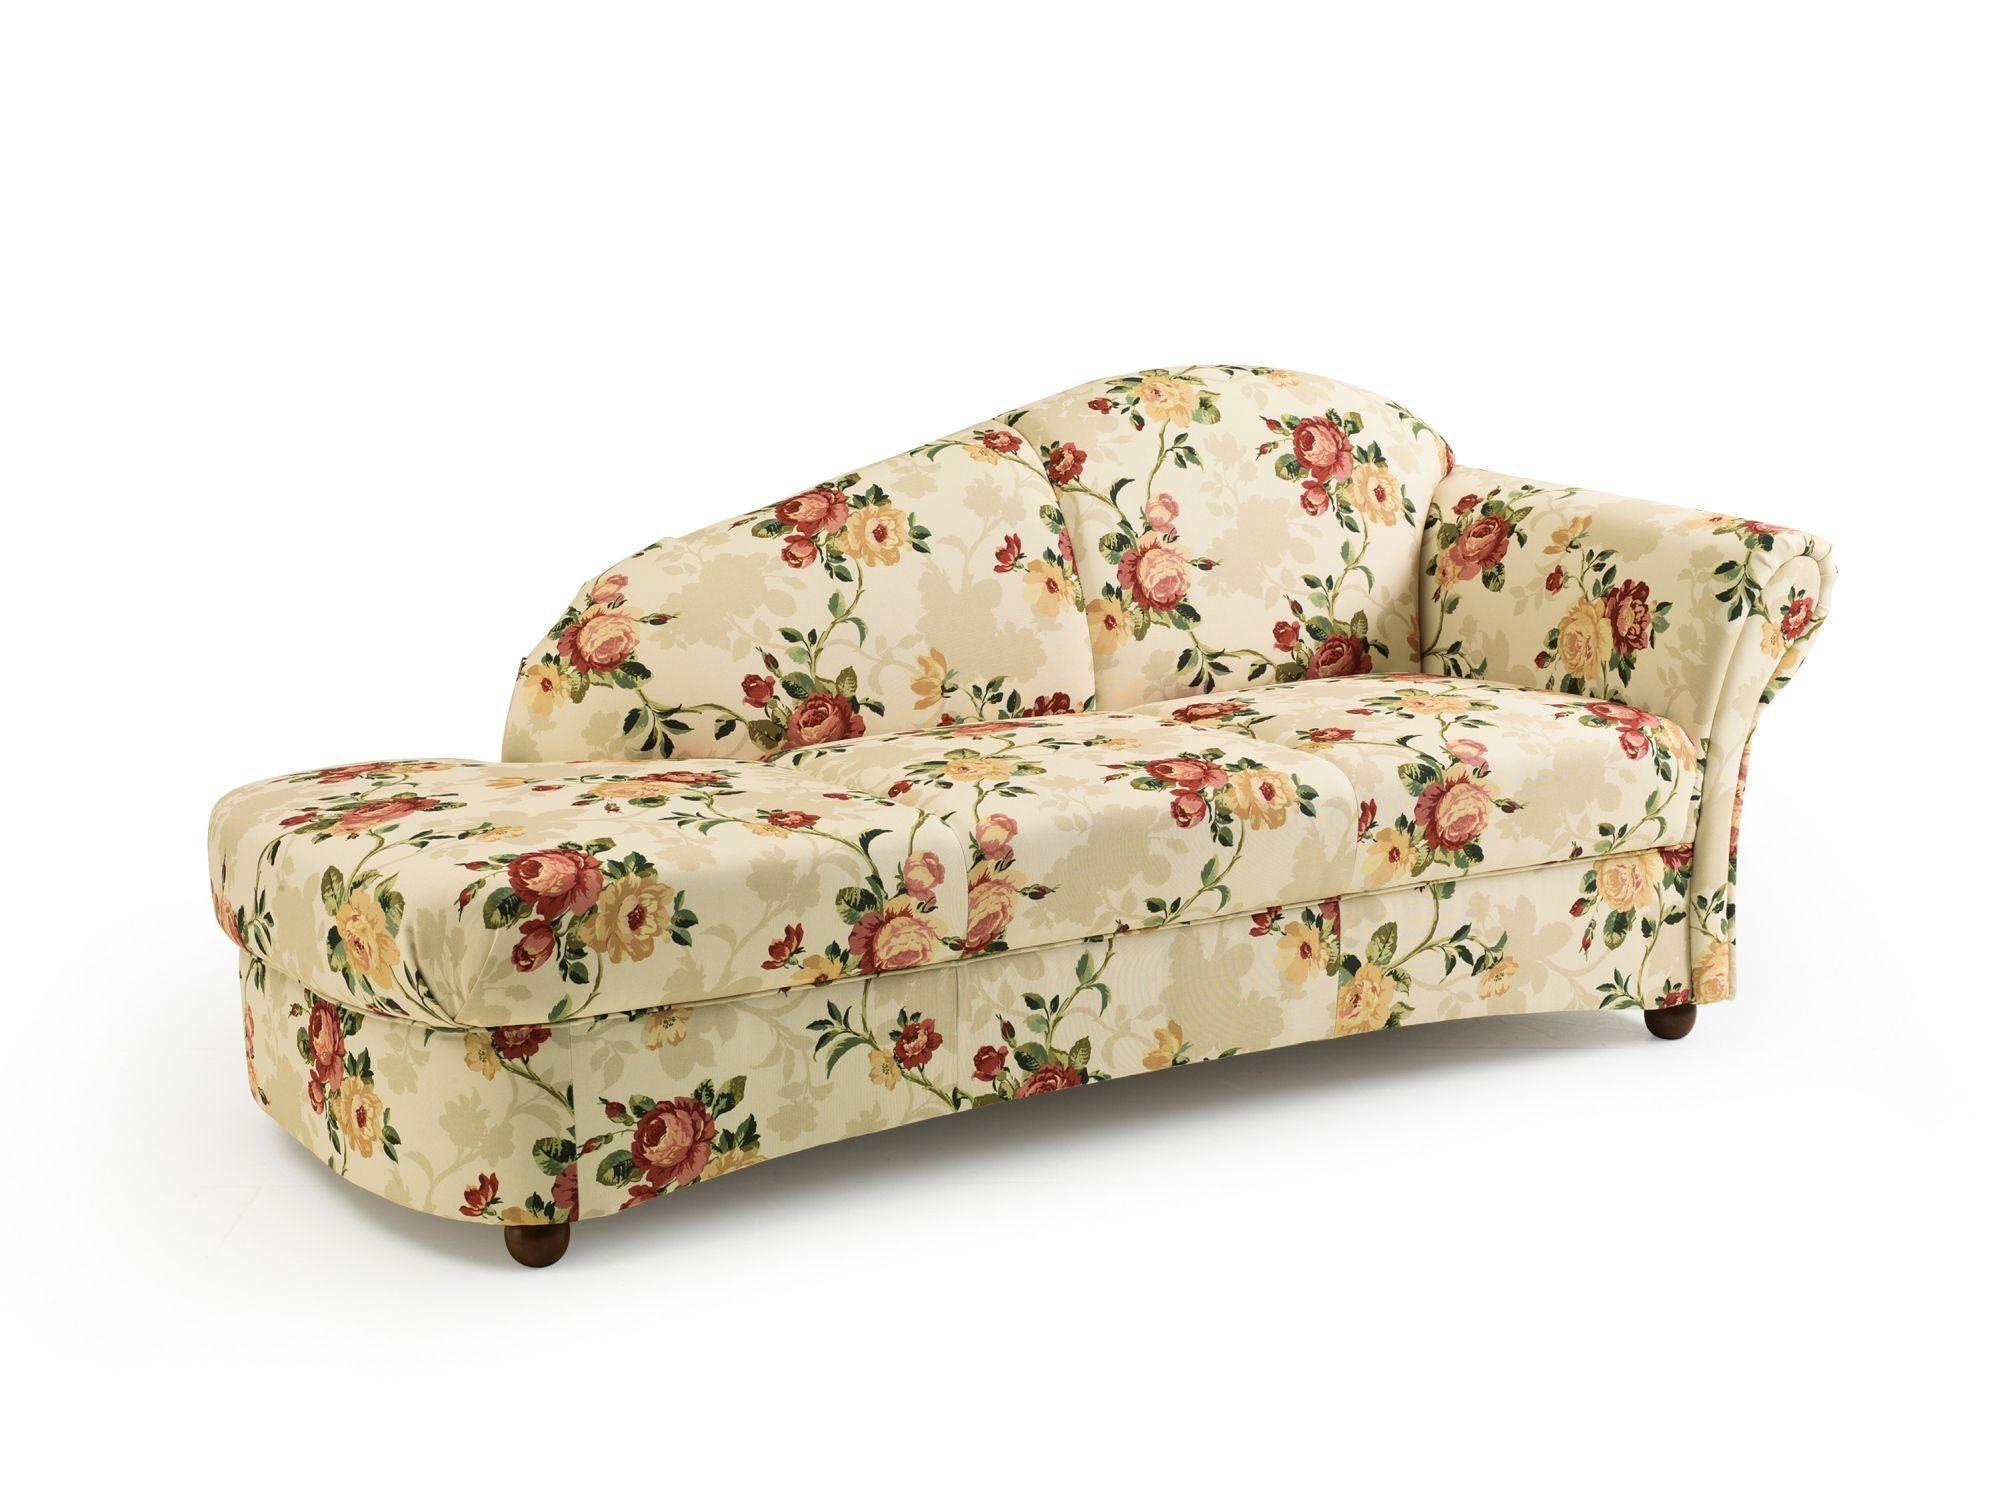 Sessel Corona multi Max Winzer Sofas Couches & Garnituren